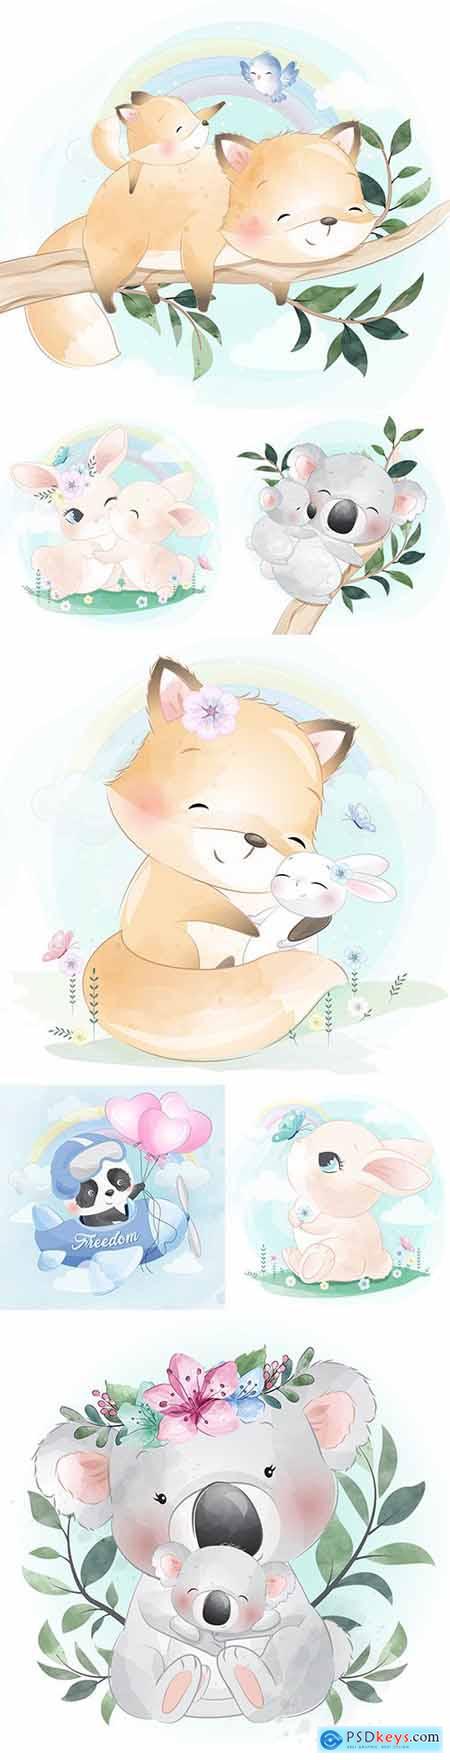 Funny animals cartoon watercolor illustrations 33